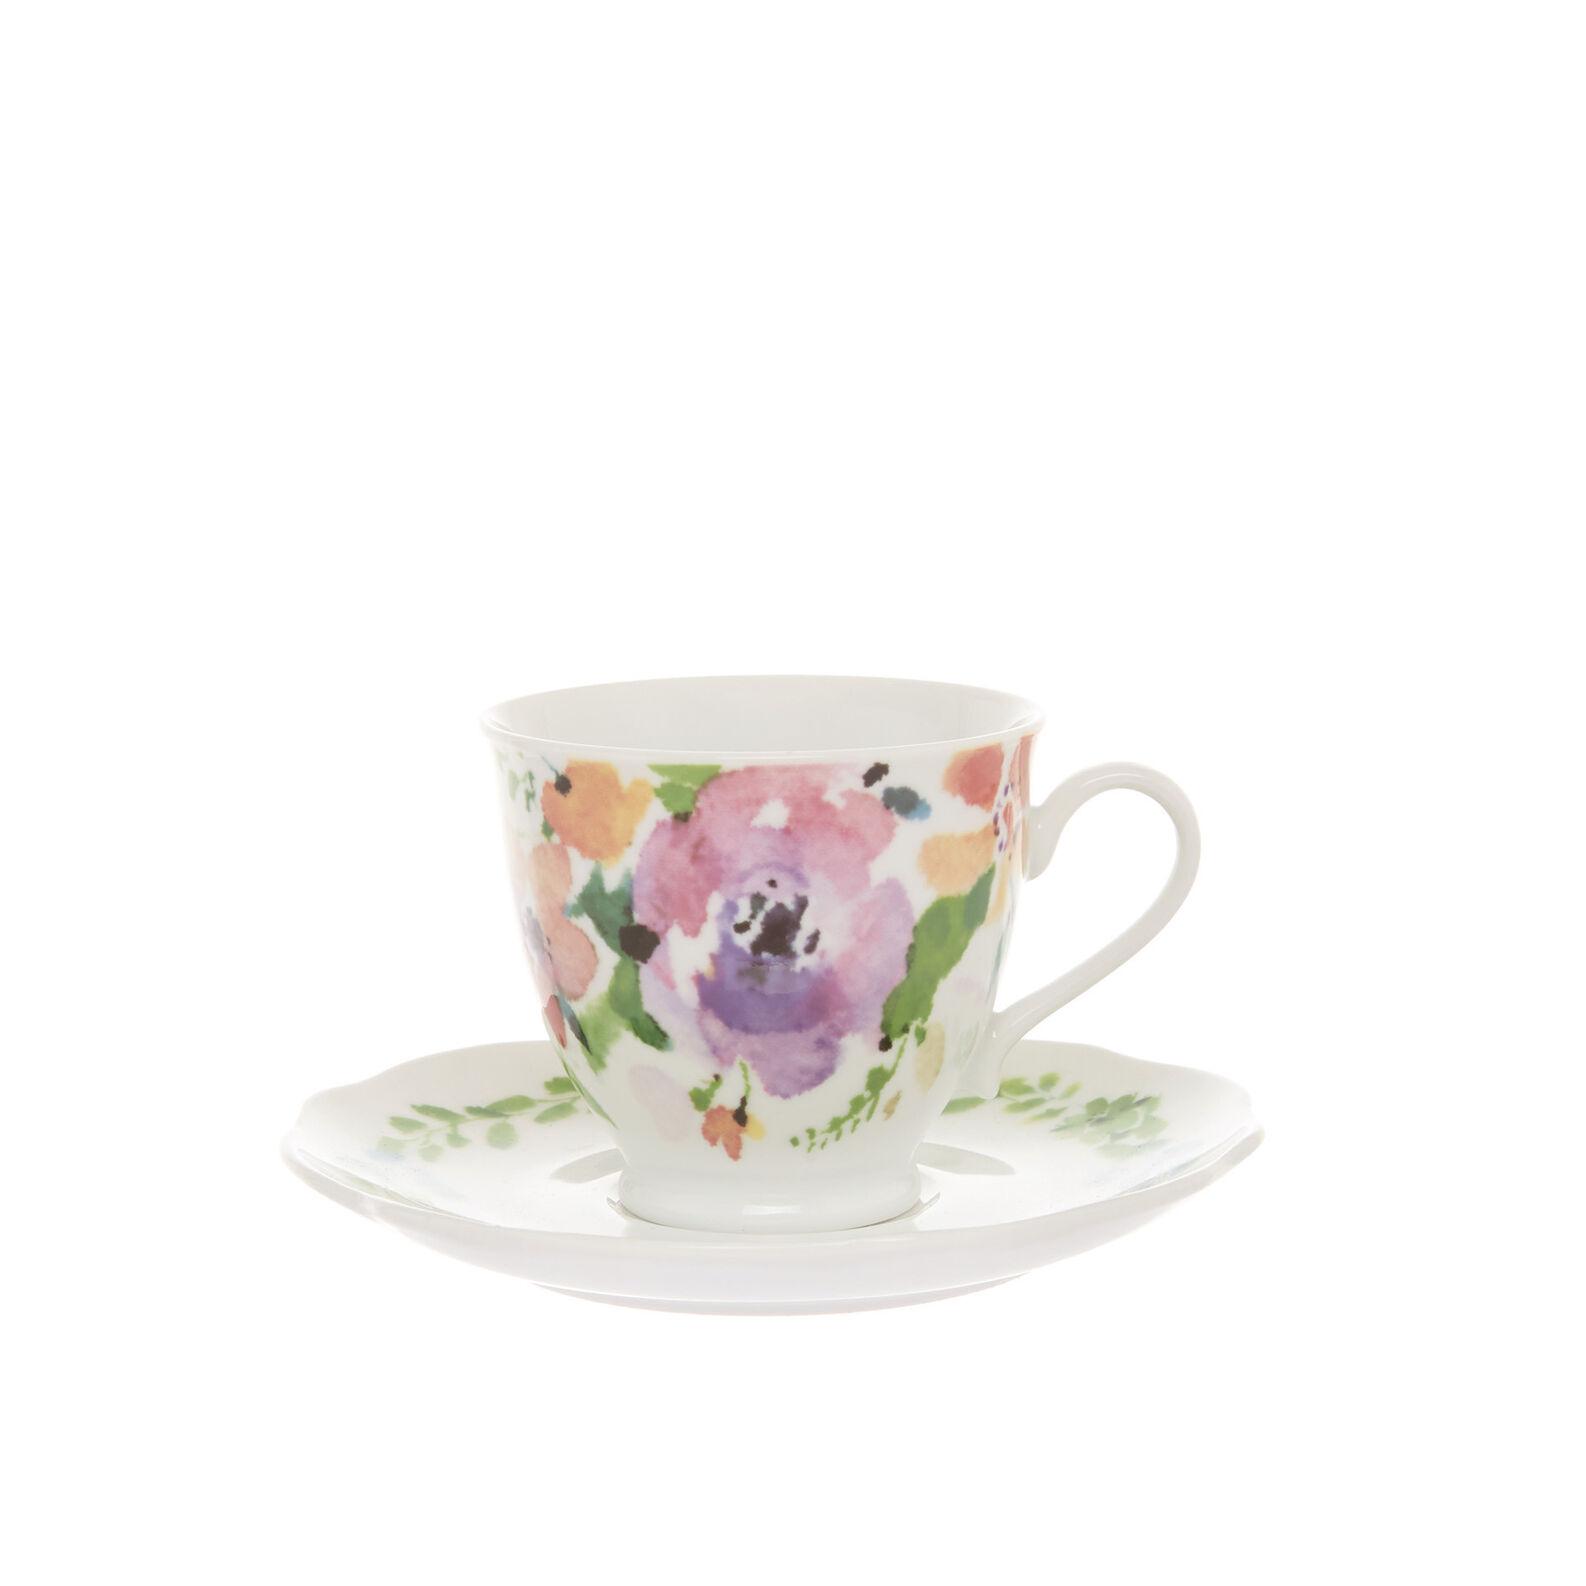 Floral porcelain teacup